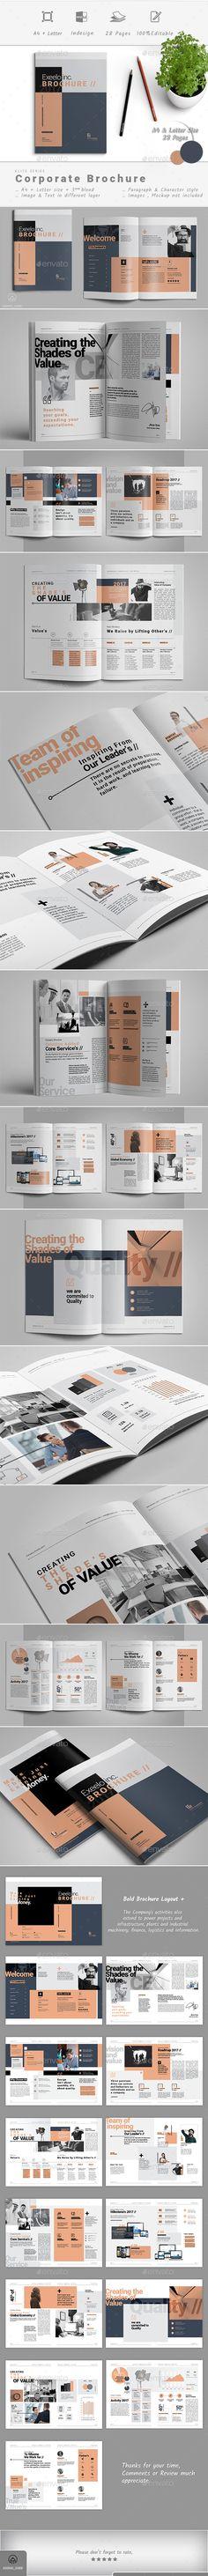 Brochure Template Brochure, Brochure Layout, Indesign Templates, Flyer Design Templates, Brochure Design, Report Template, Business Brochure, Company Brochure, Corporate Business